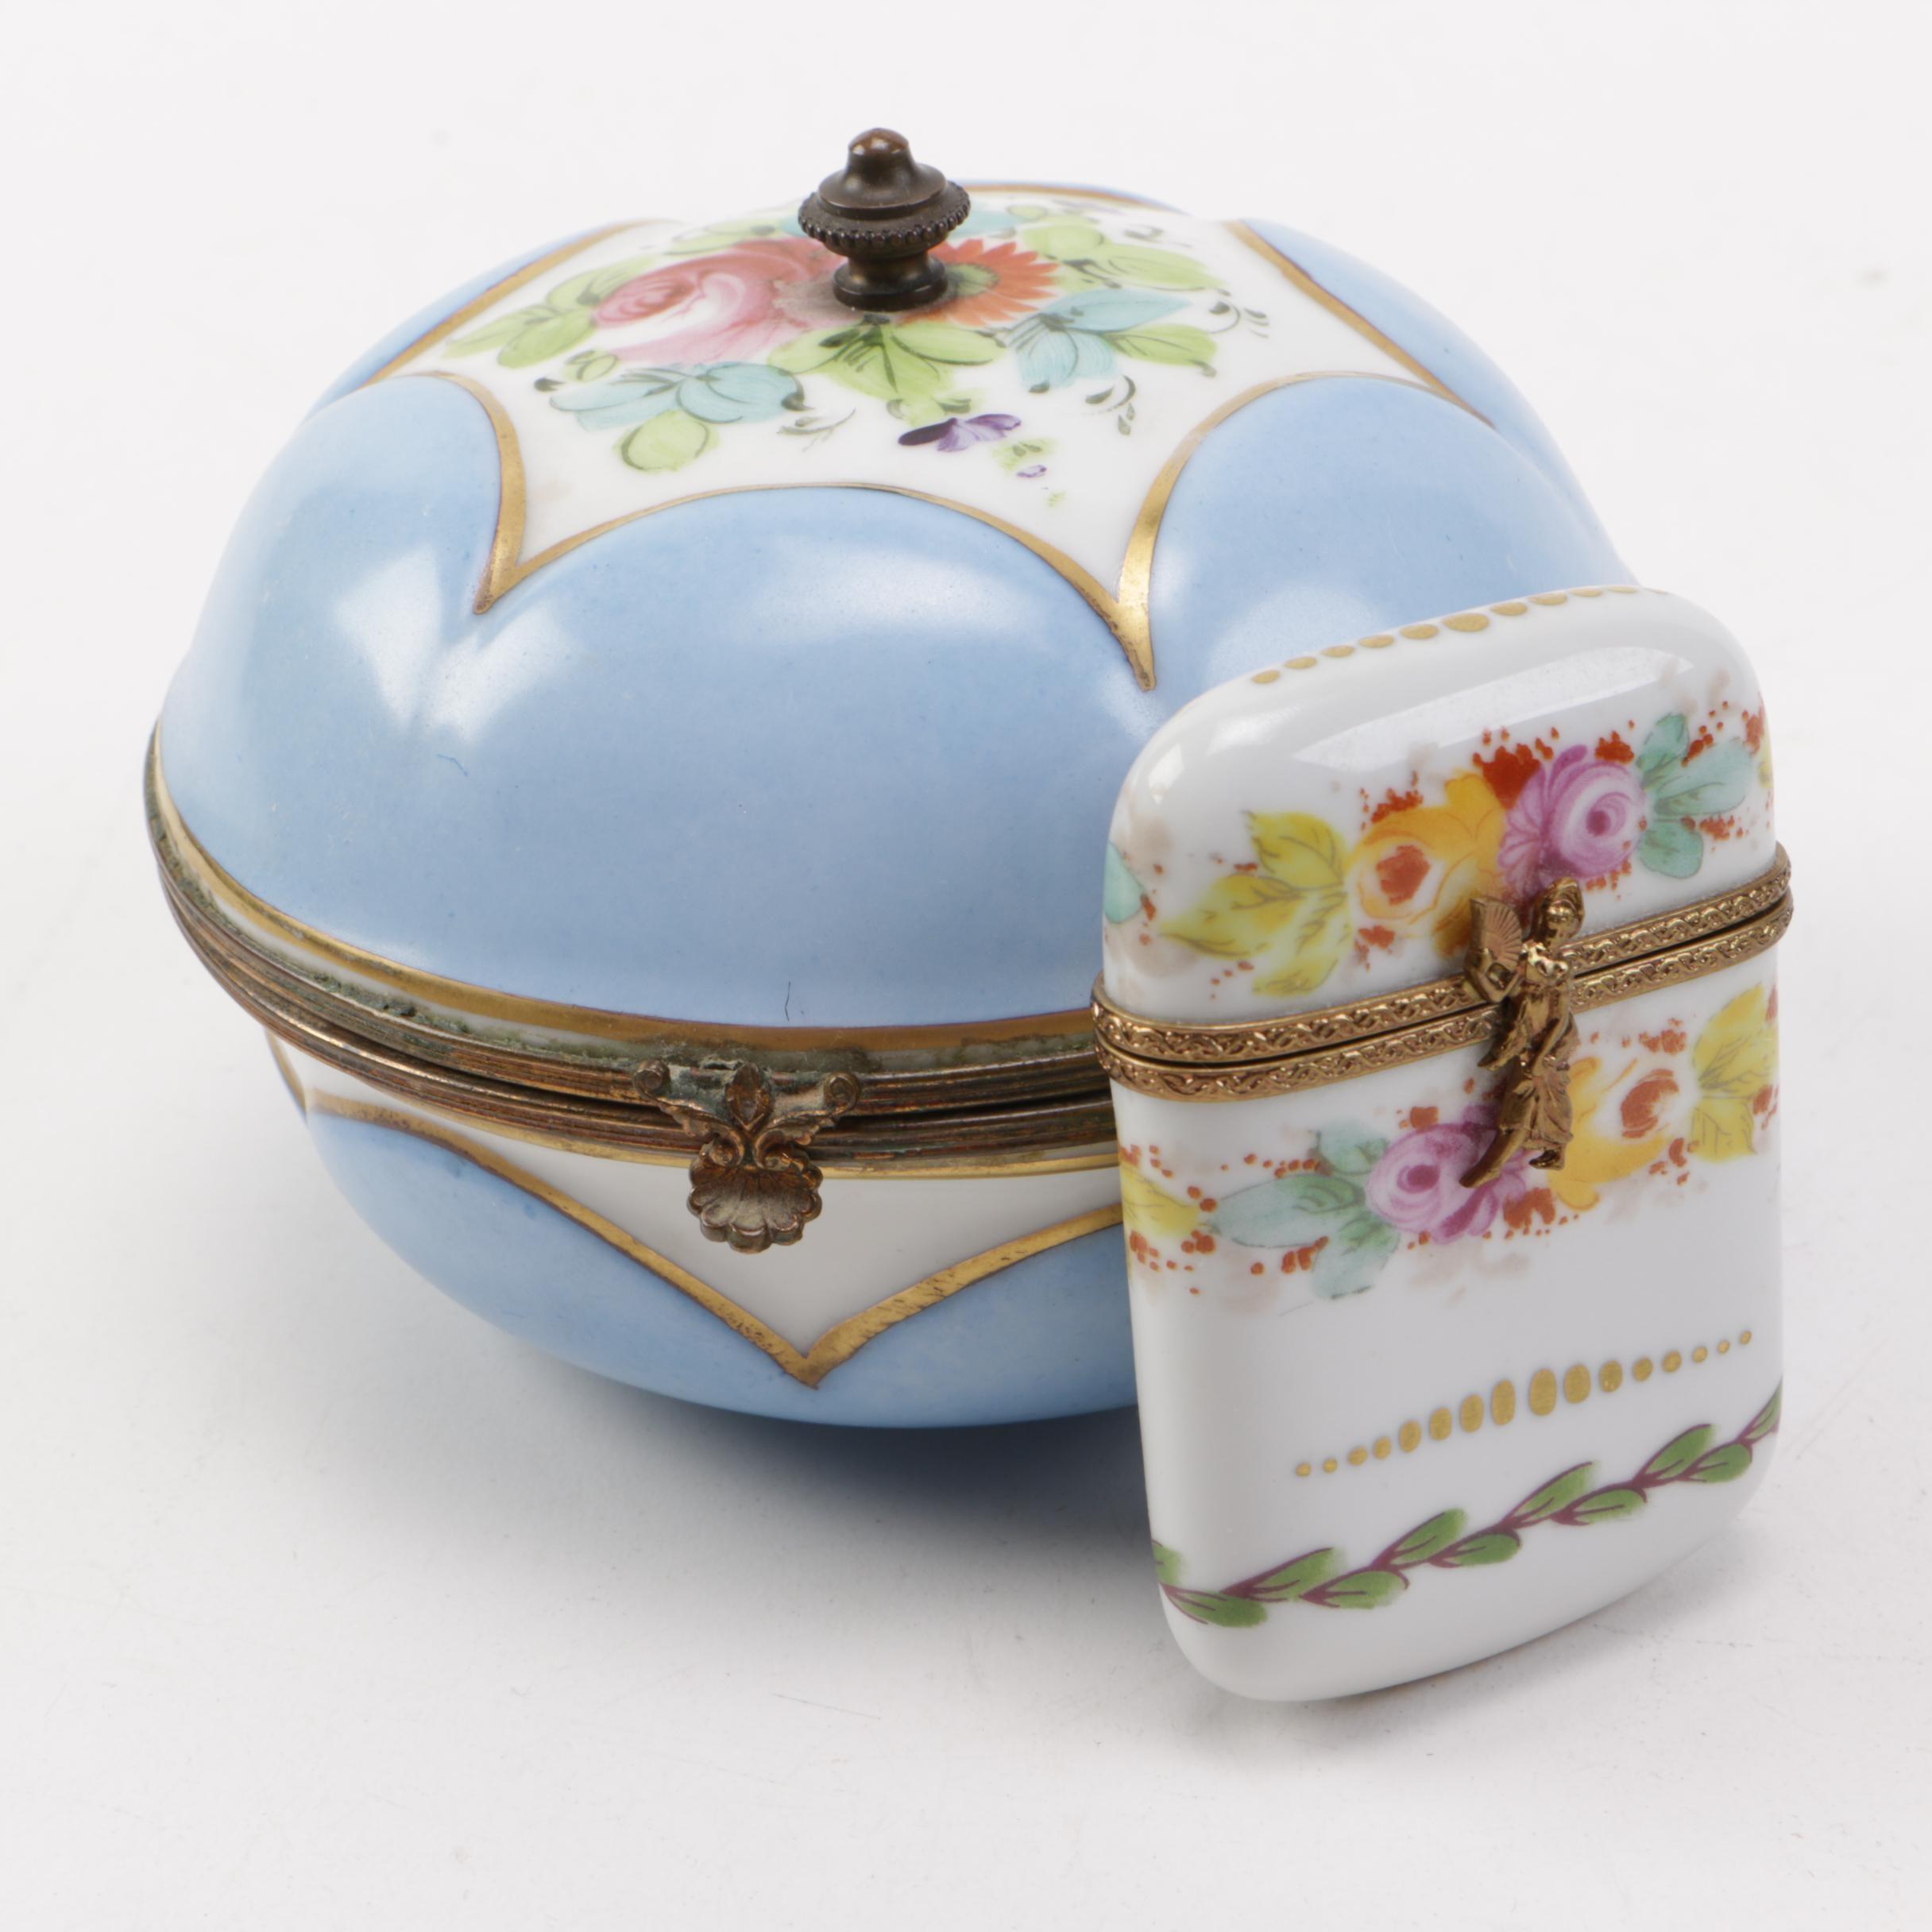 Pairing of Porcelain Trinket Boxes